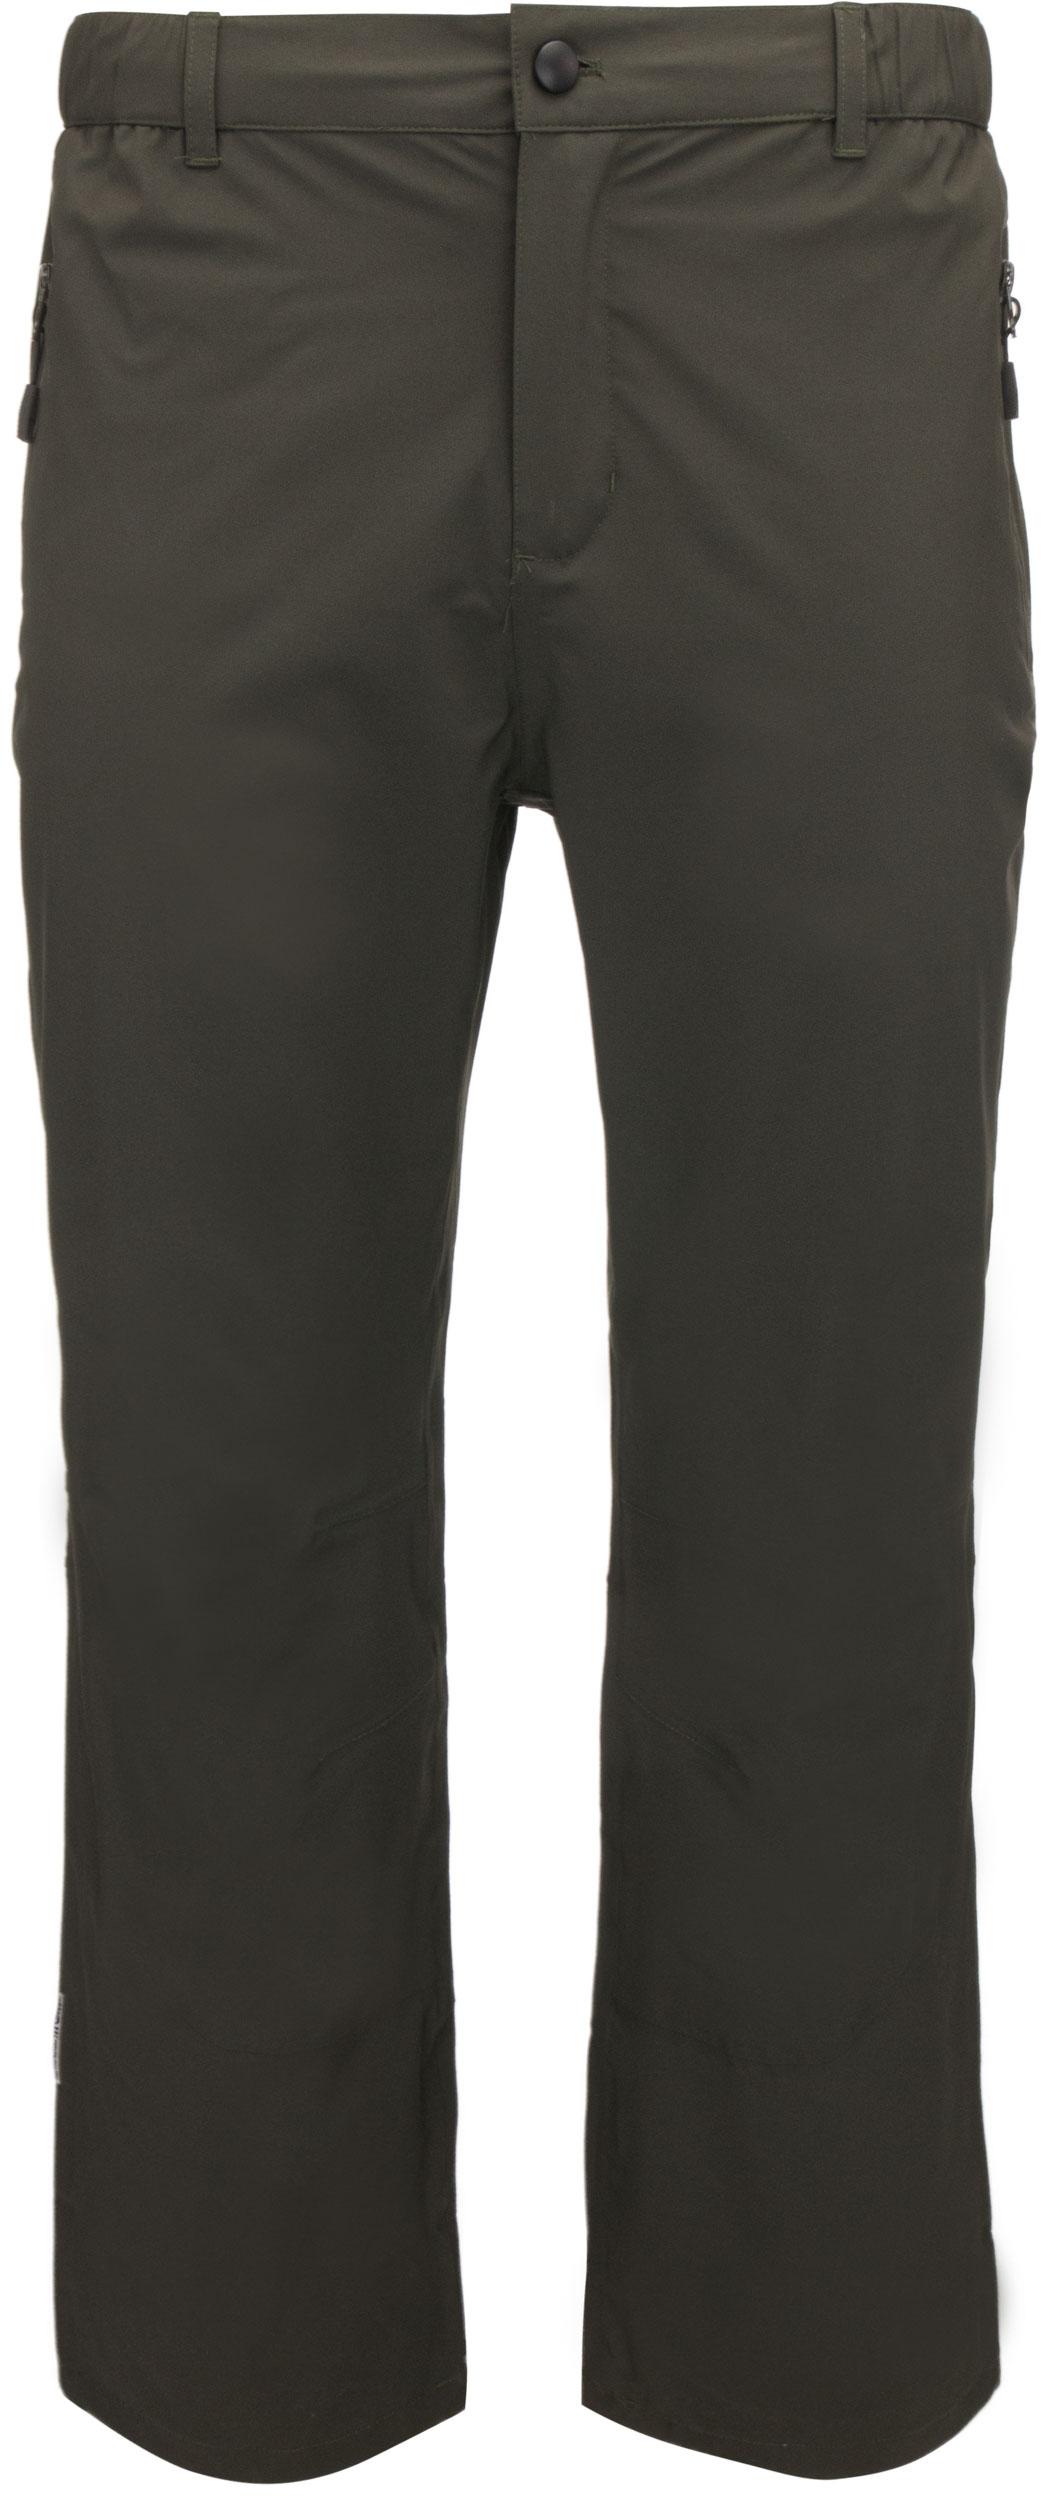 Pánské outdoorové kalhoty Rukka Raul Trousers